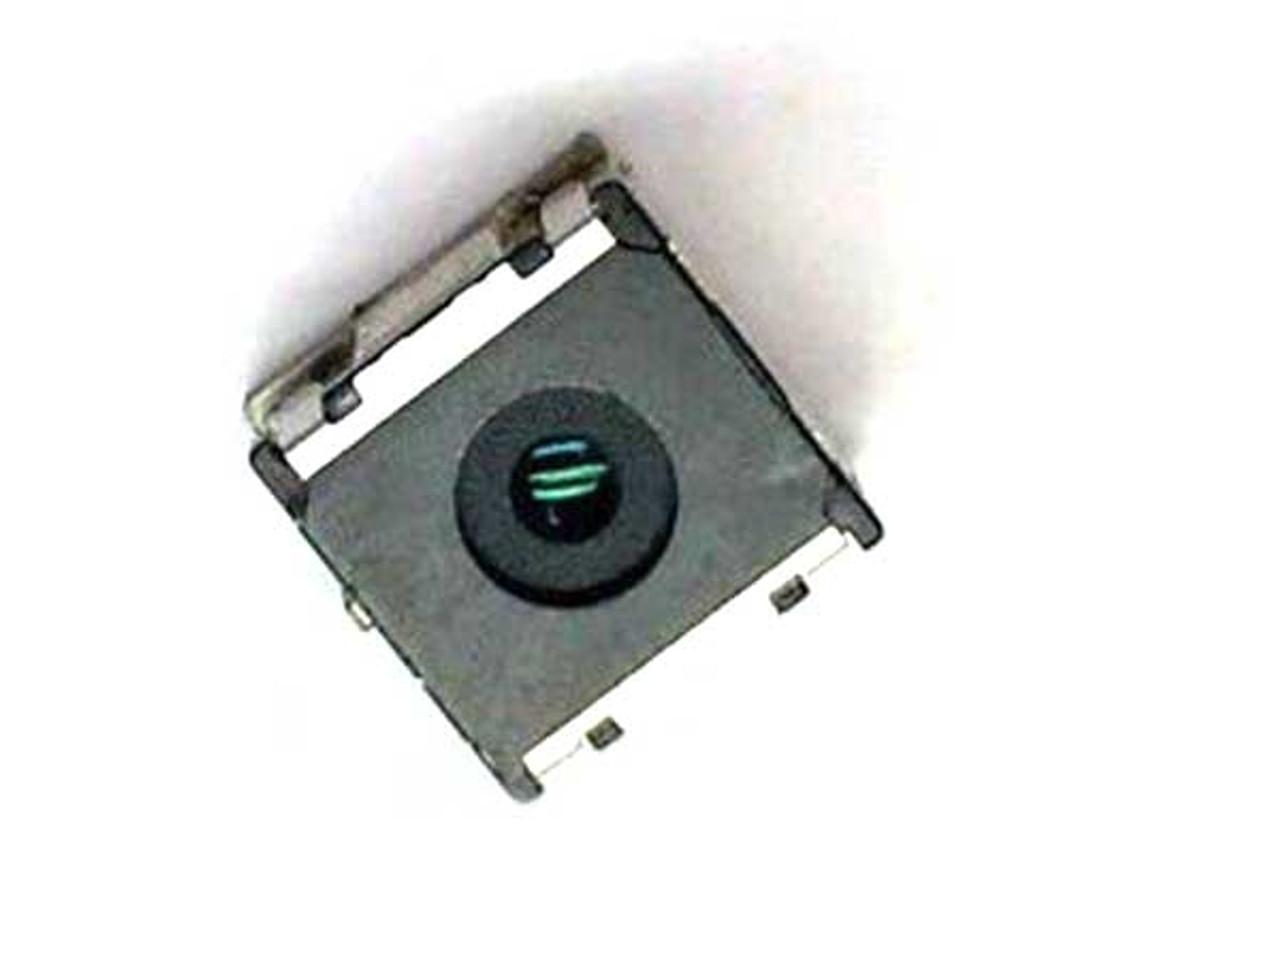 Nokia 6700 Classic Camera from www.parts4repair.com